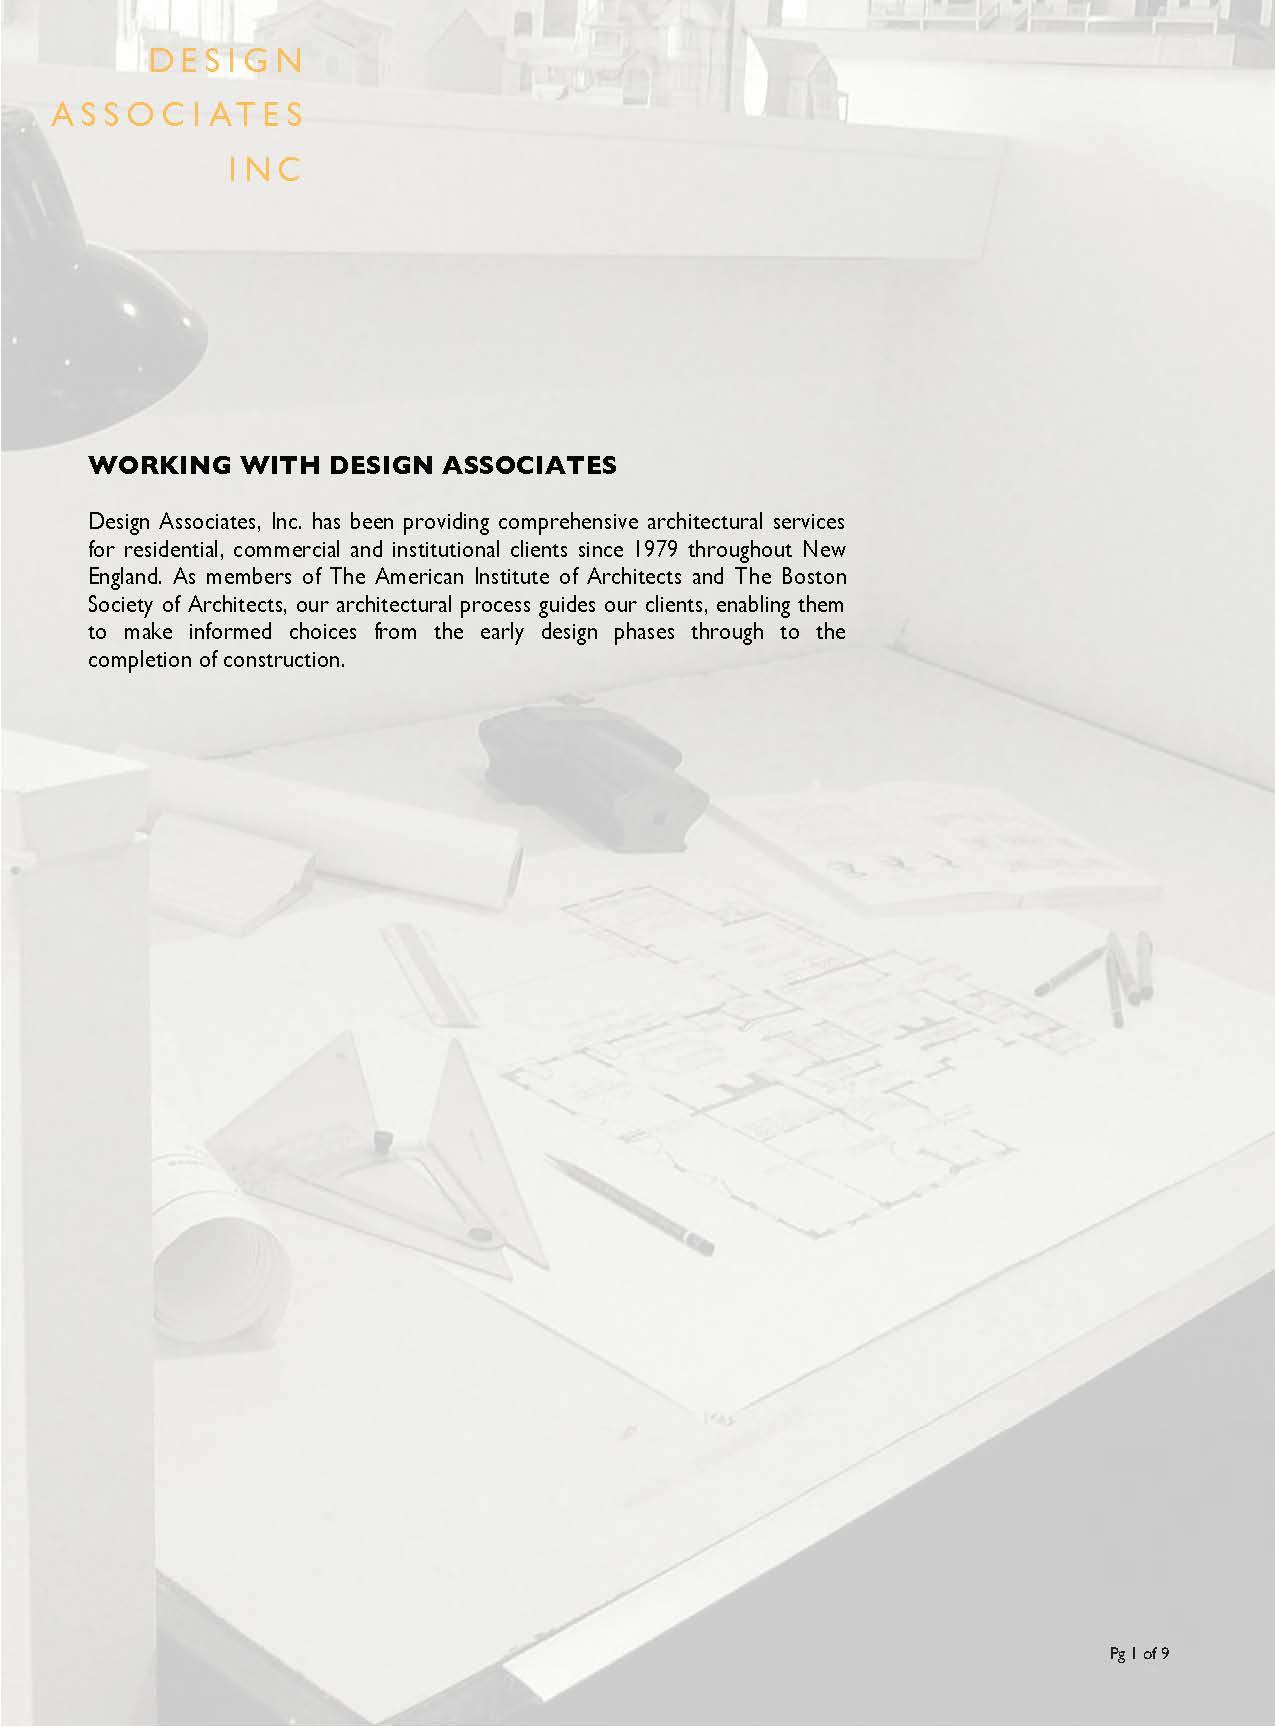 Working With Design Associates Image.jpg